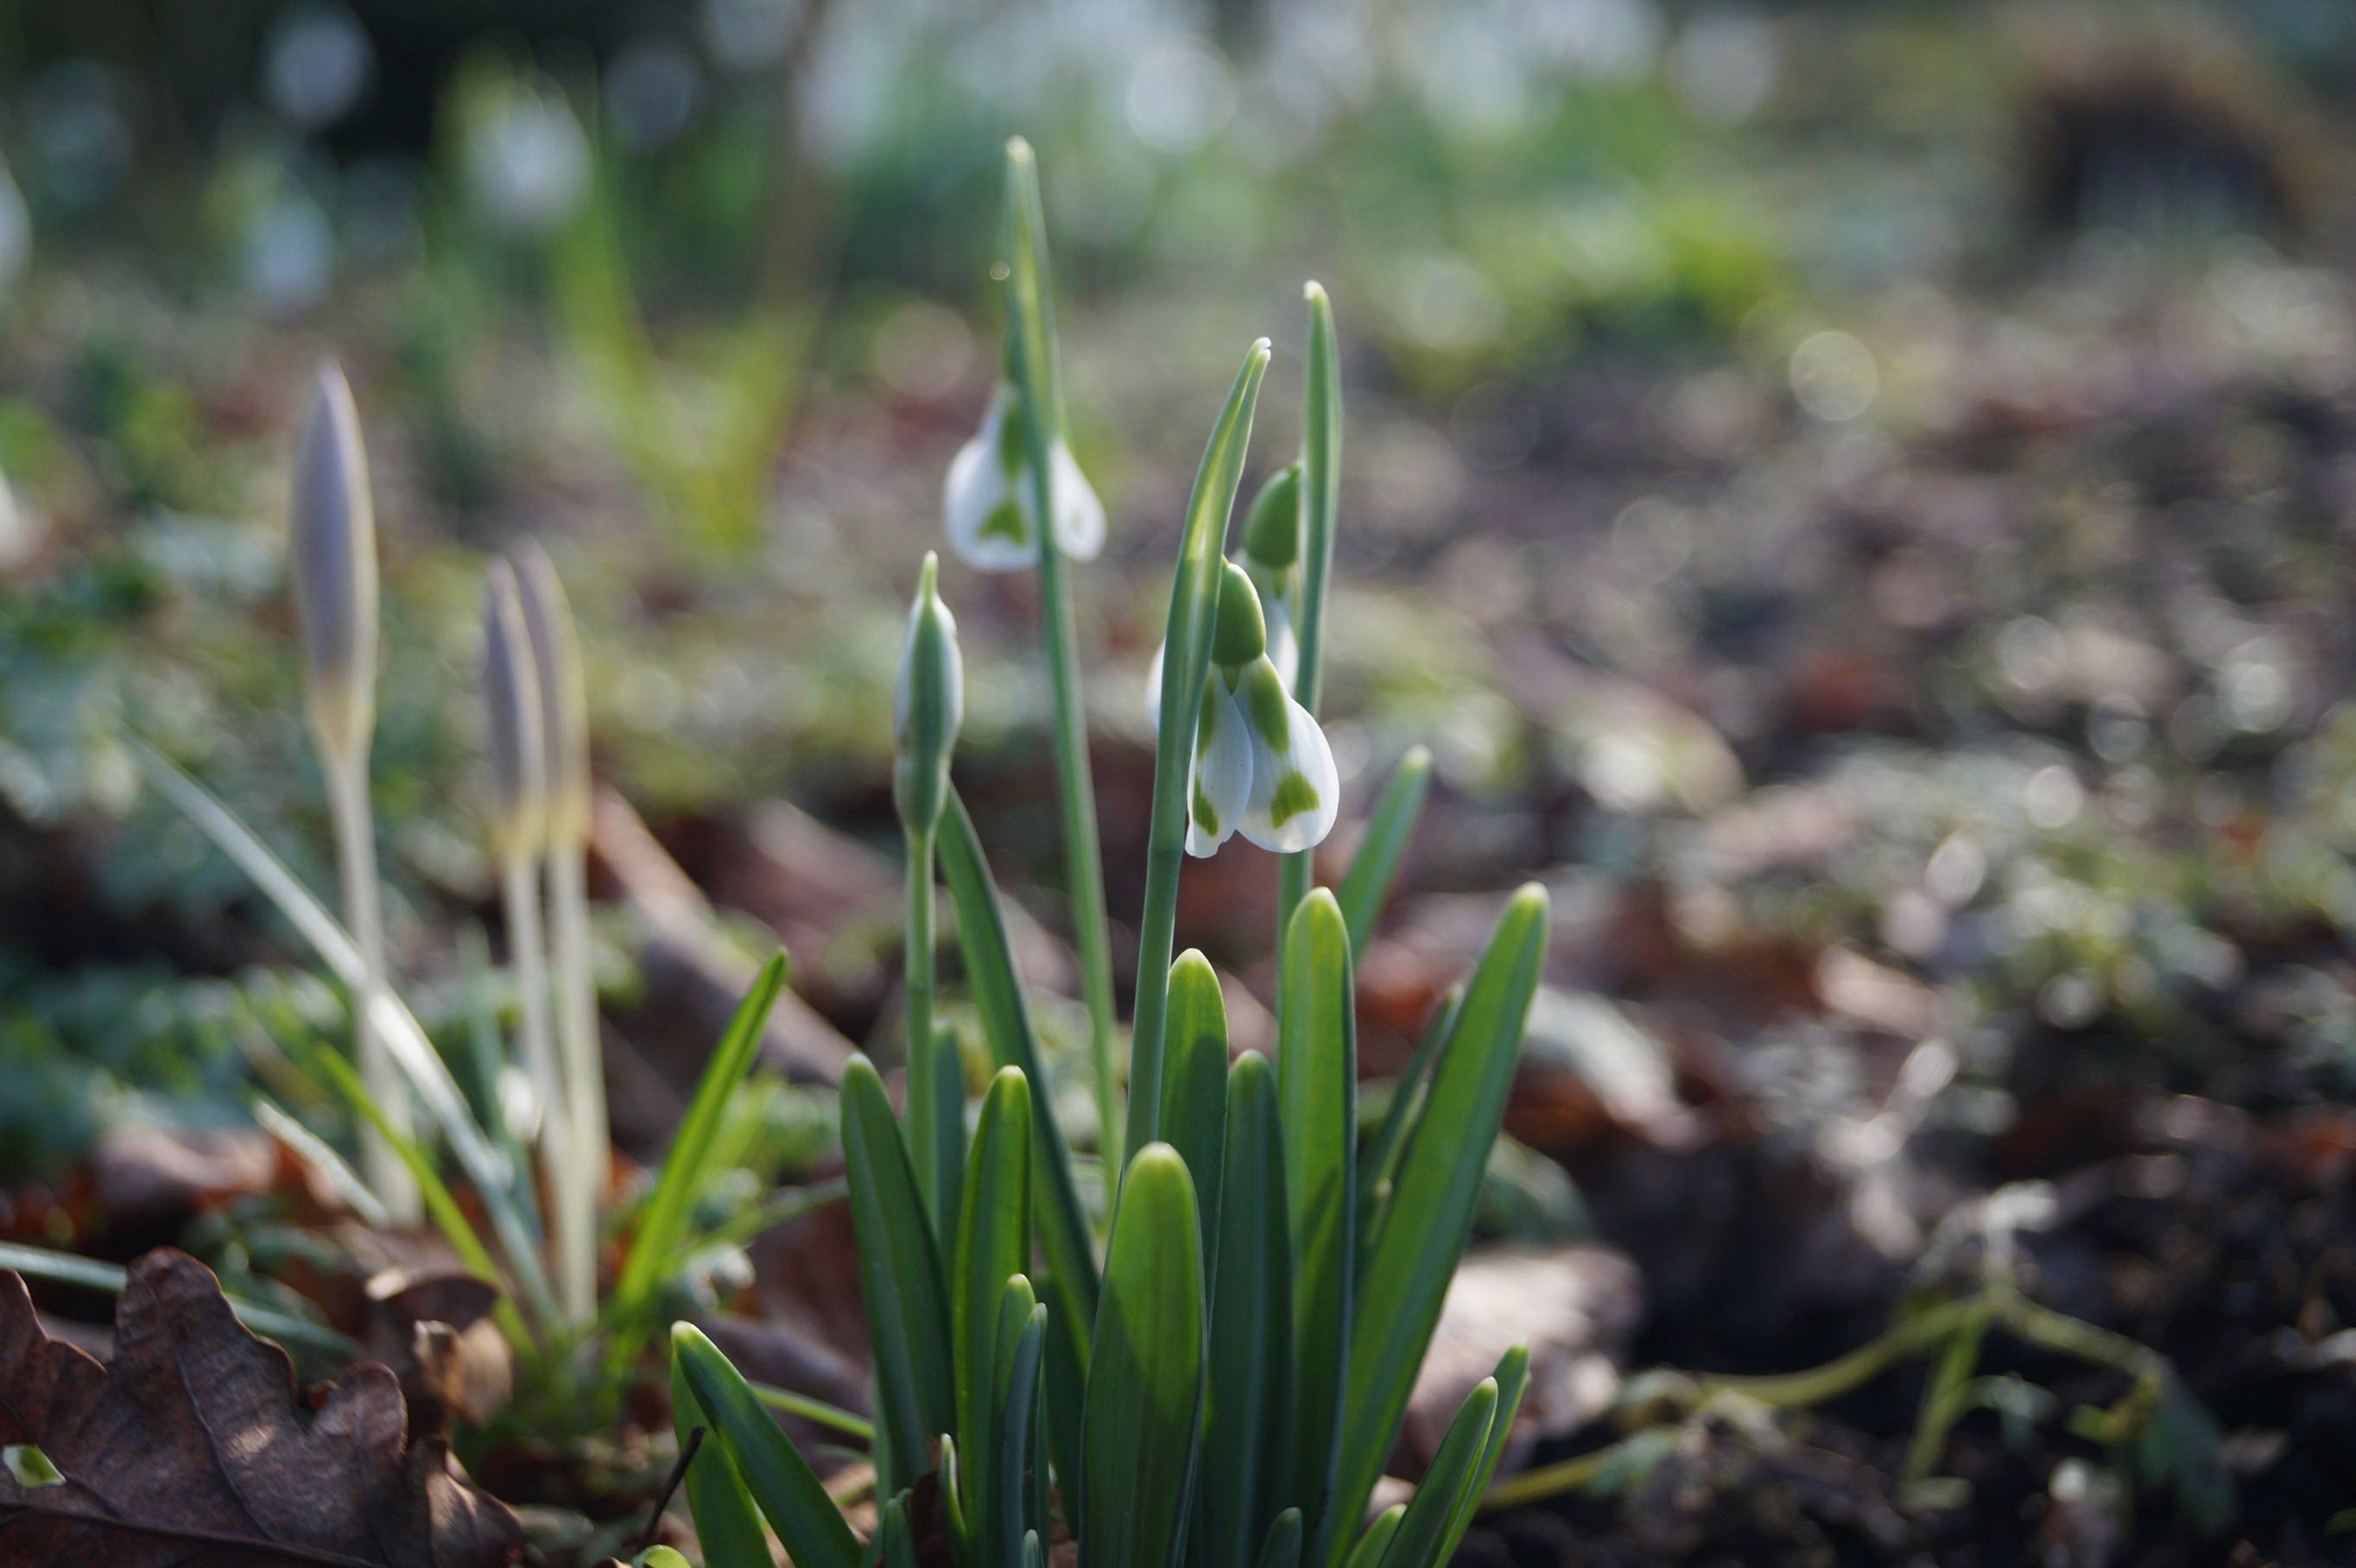 galanthus_phillipe_andre_meyer_morlas_plants